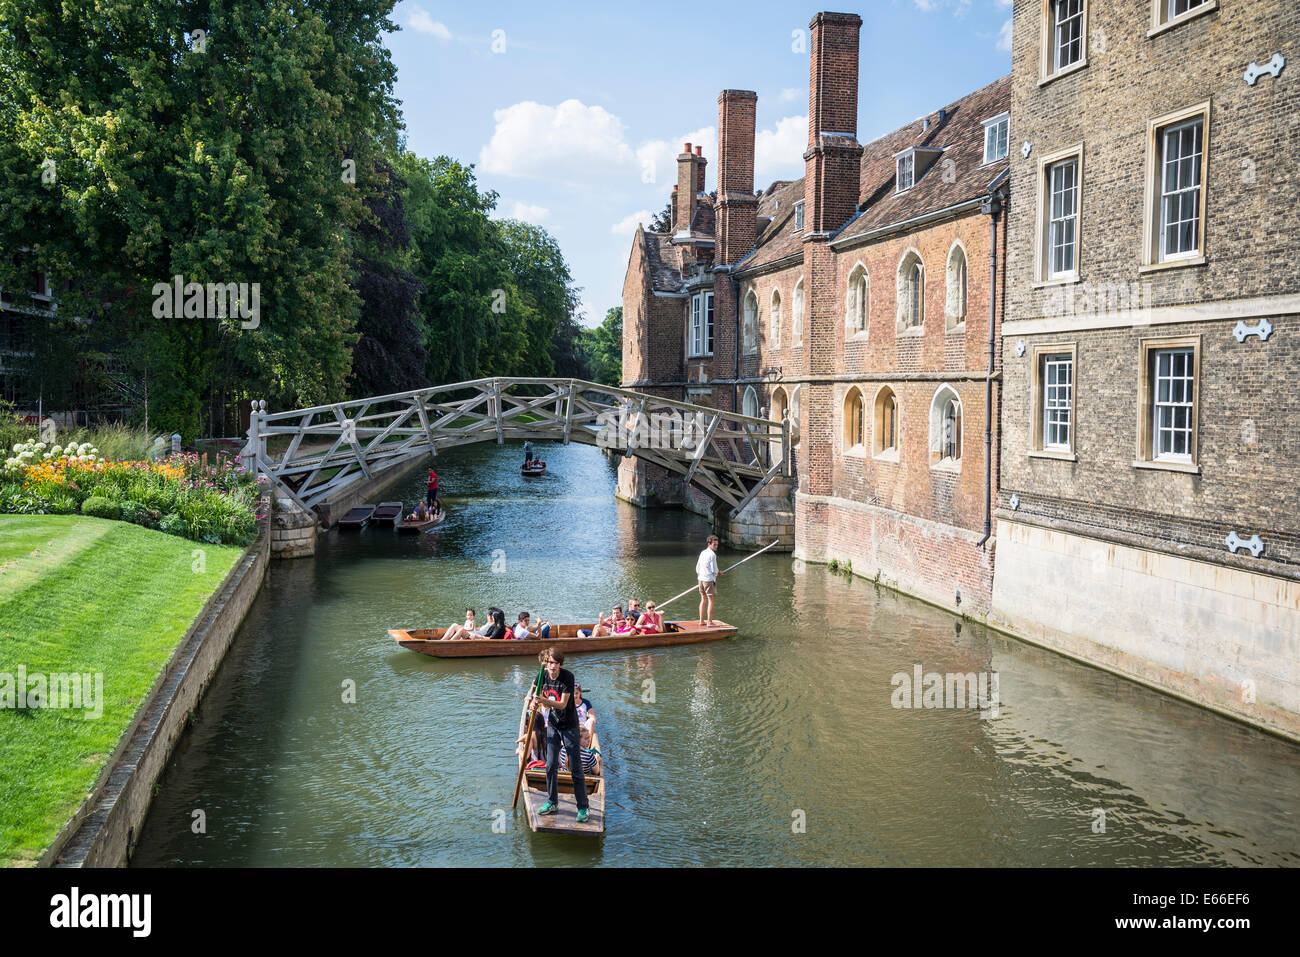 Mathematical Bridge and punts on the River Cam, Cambridge, England, UK - Stock Image